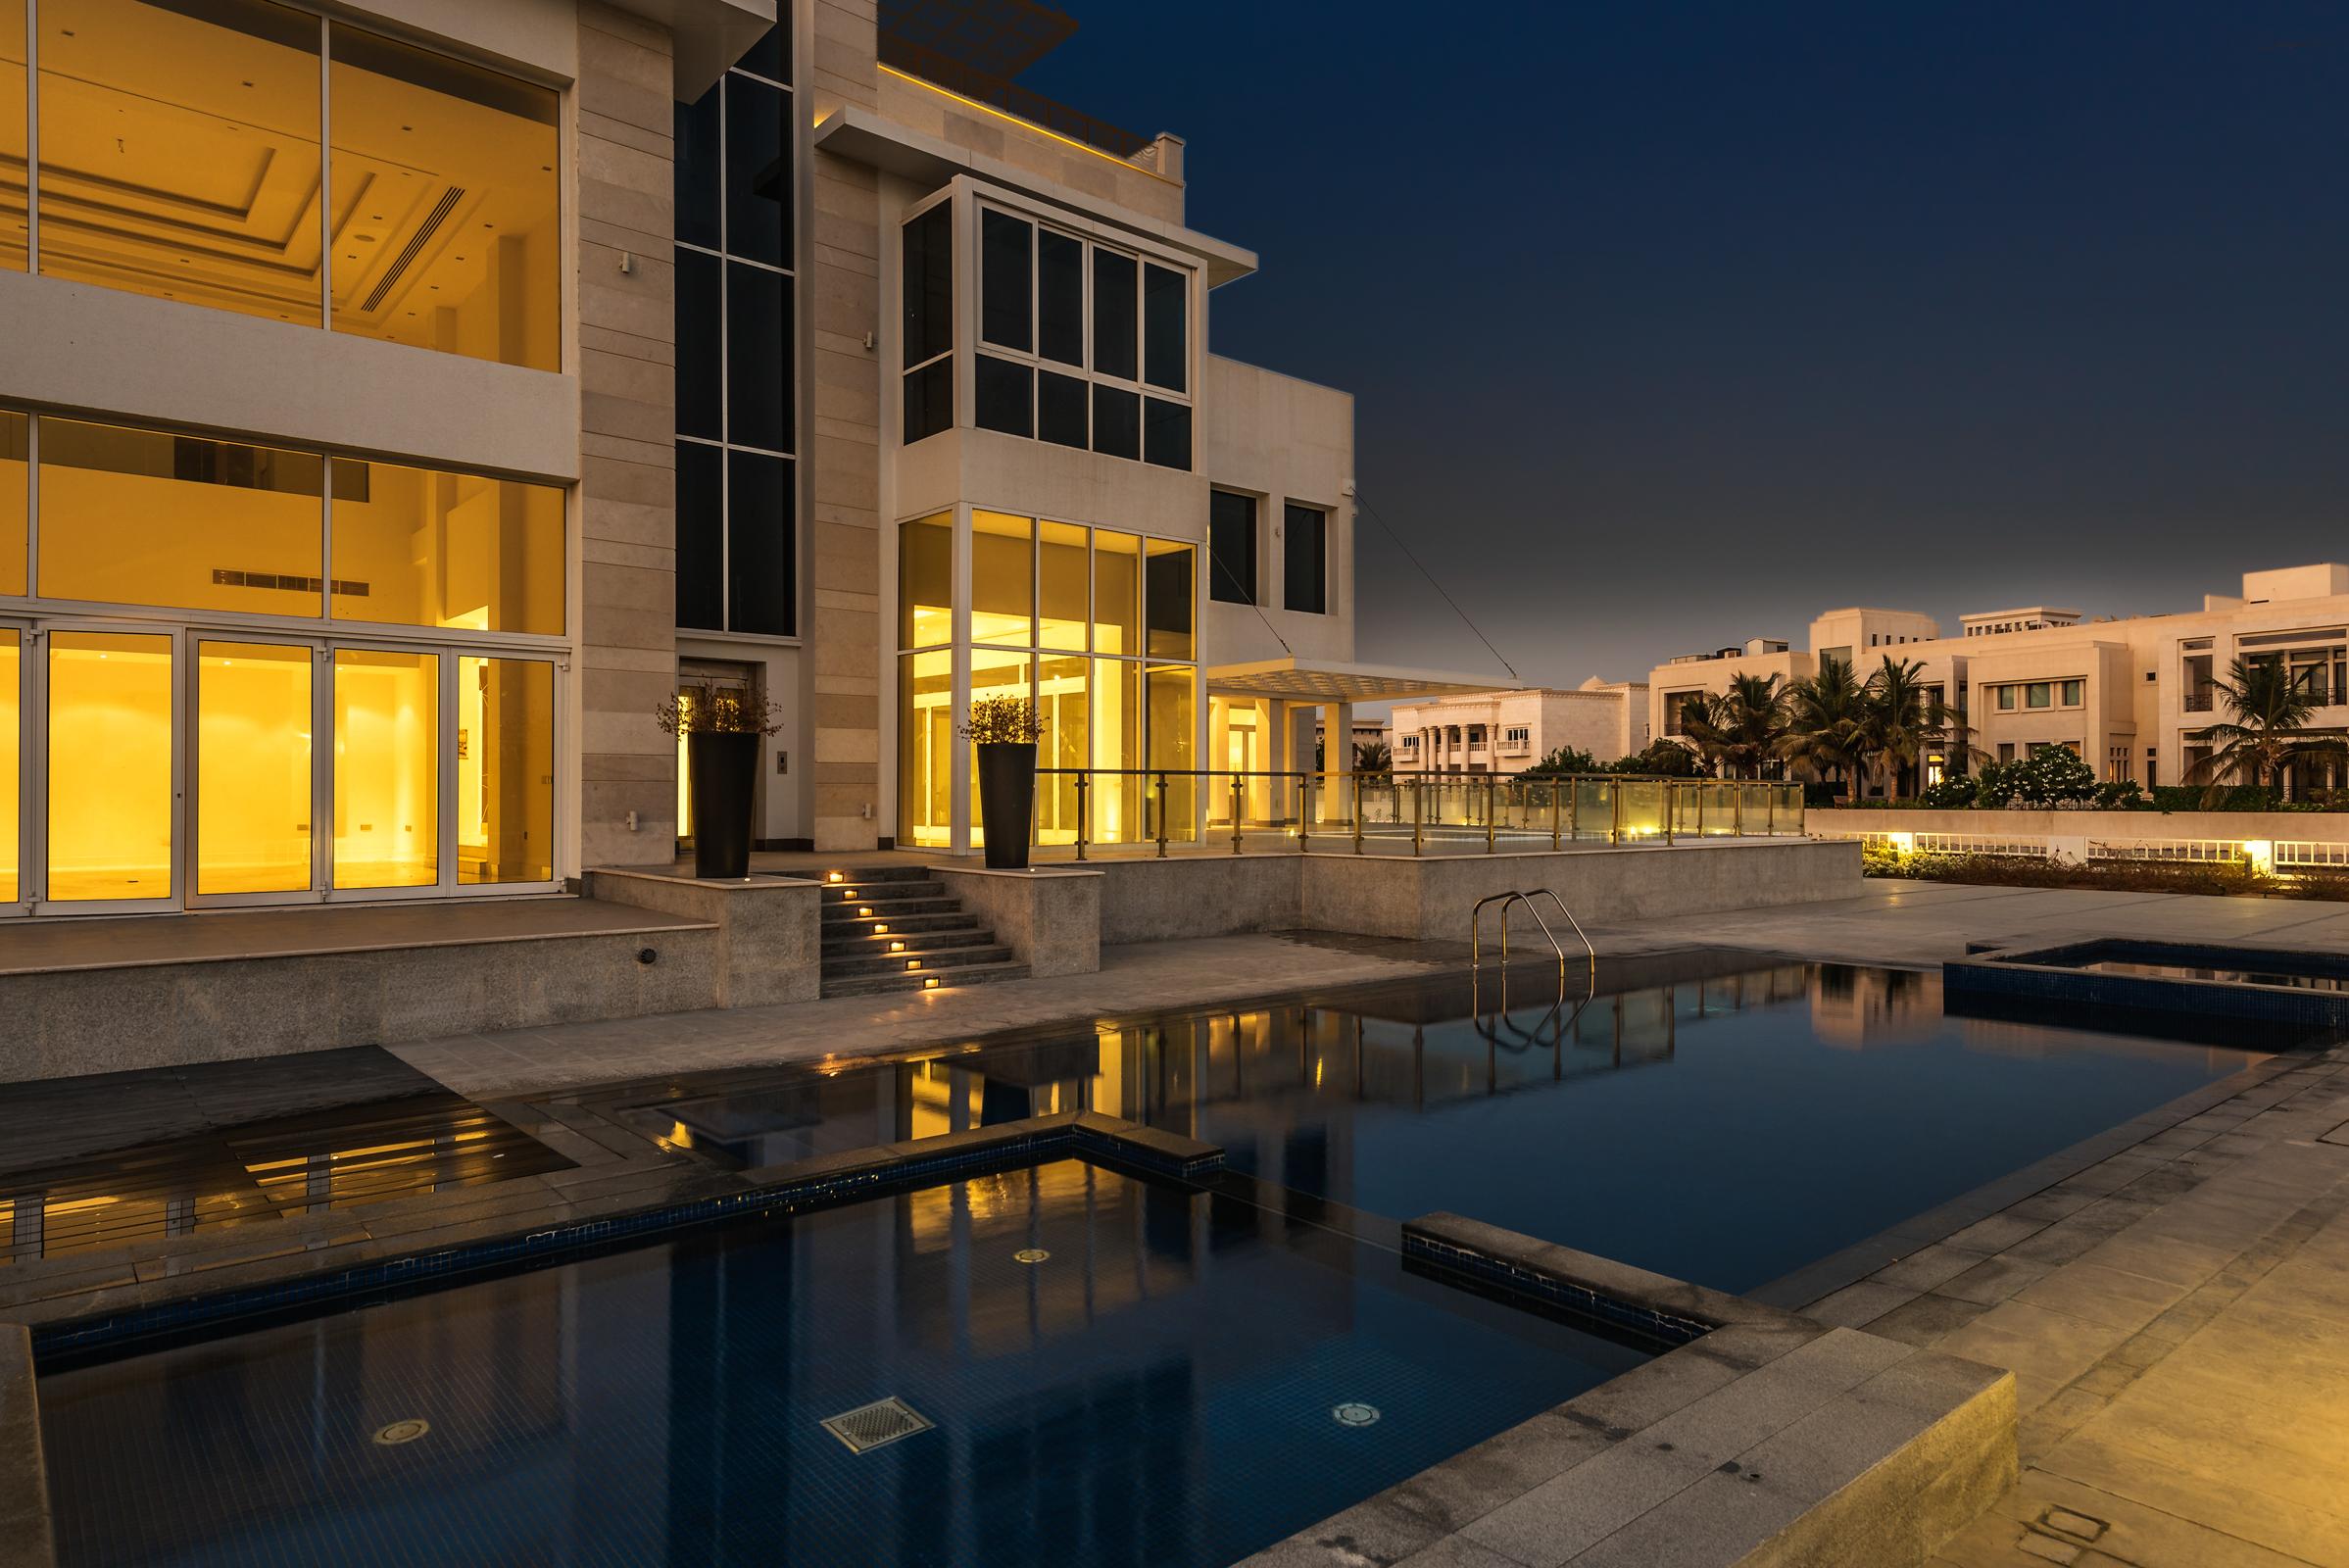 独户住宅 为 销售 在 Exquisite Emirates Hills Villa Emirates Hills, 迪拜, 阿联酋